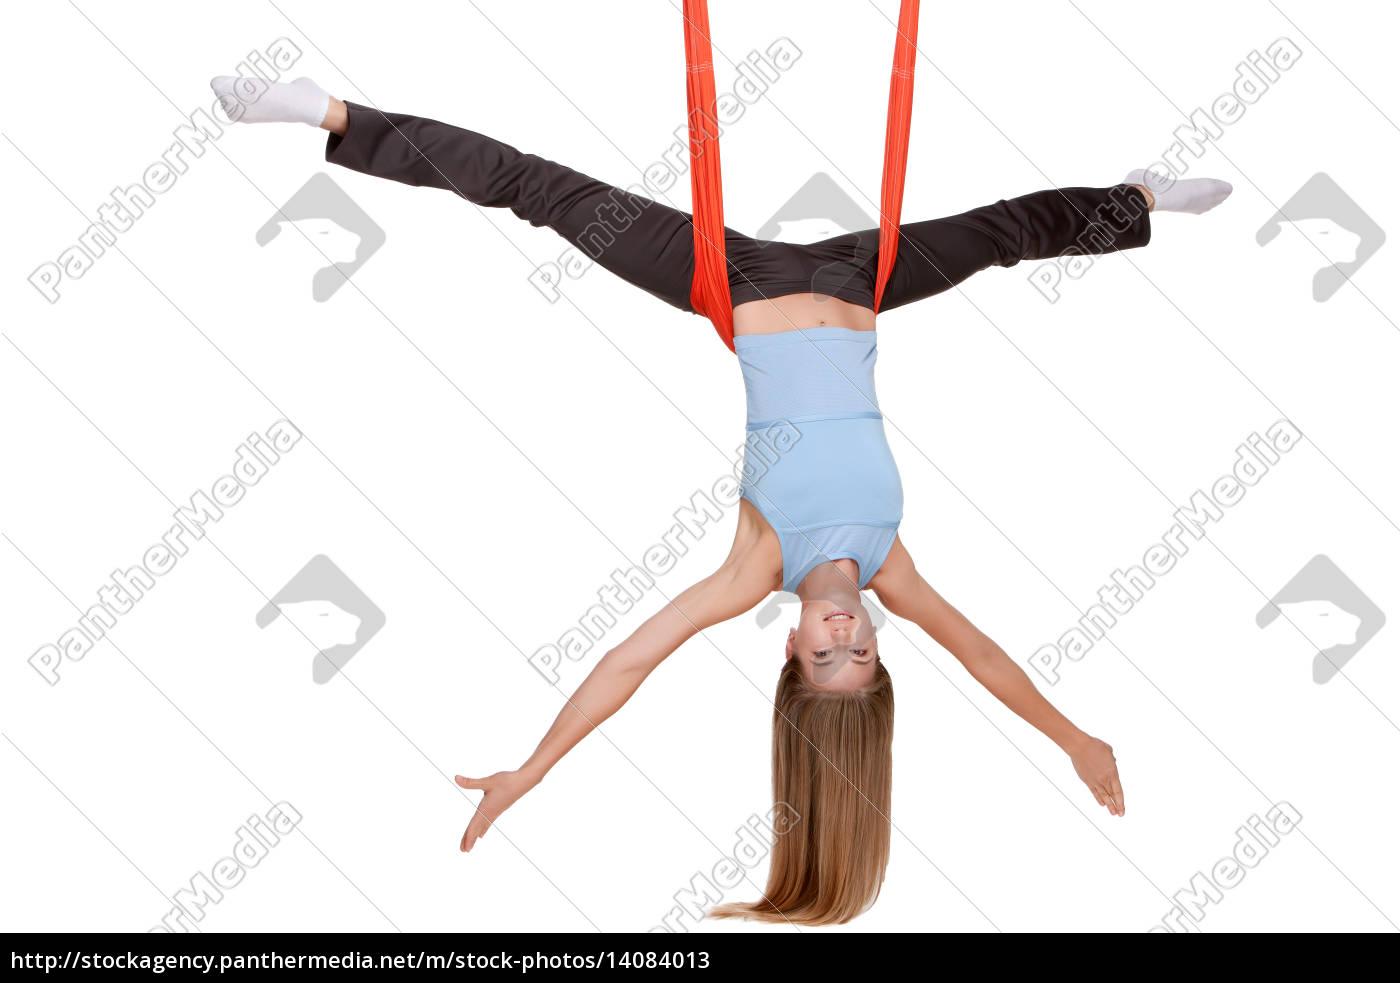 young, woman, making, antigravity, yoga, exercises - 14084013